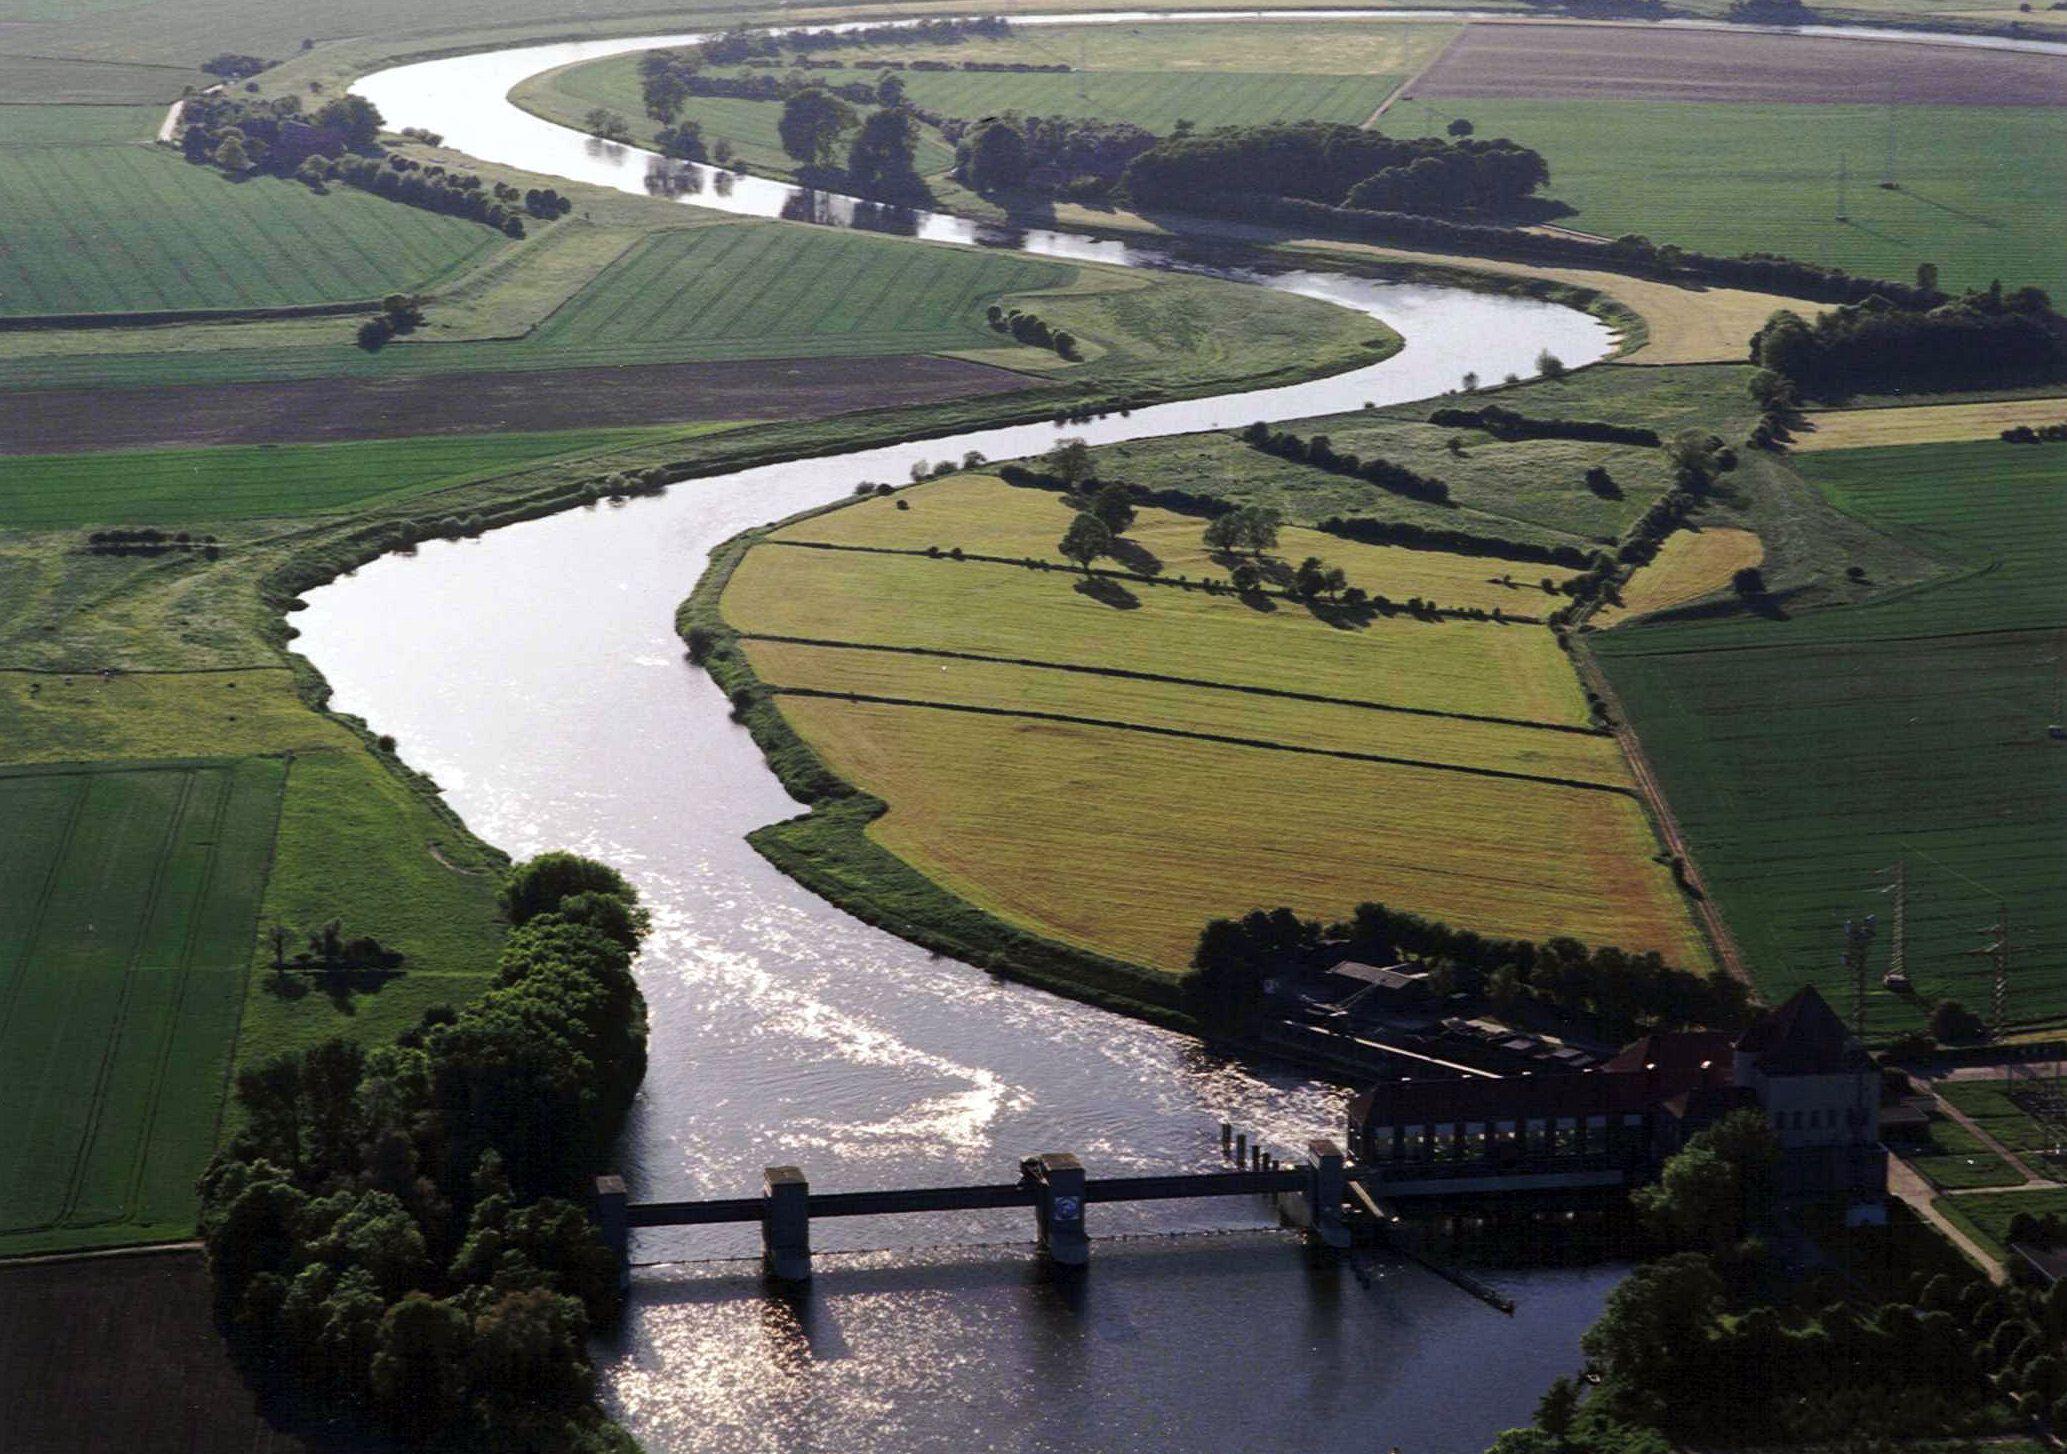 Luftbild Weser-Kraftwerk in Dörverden